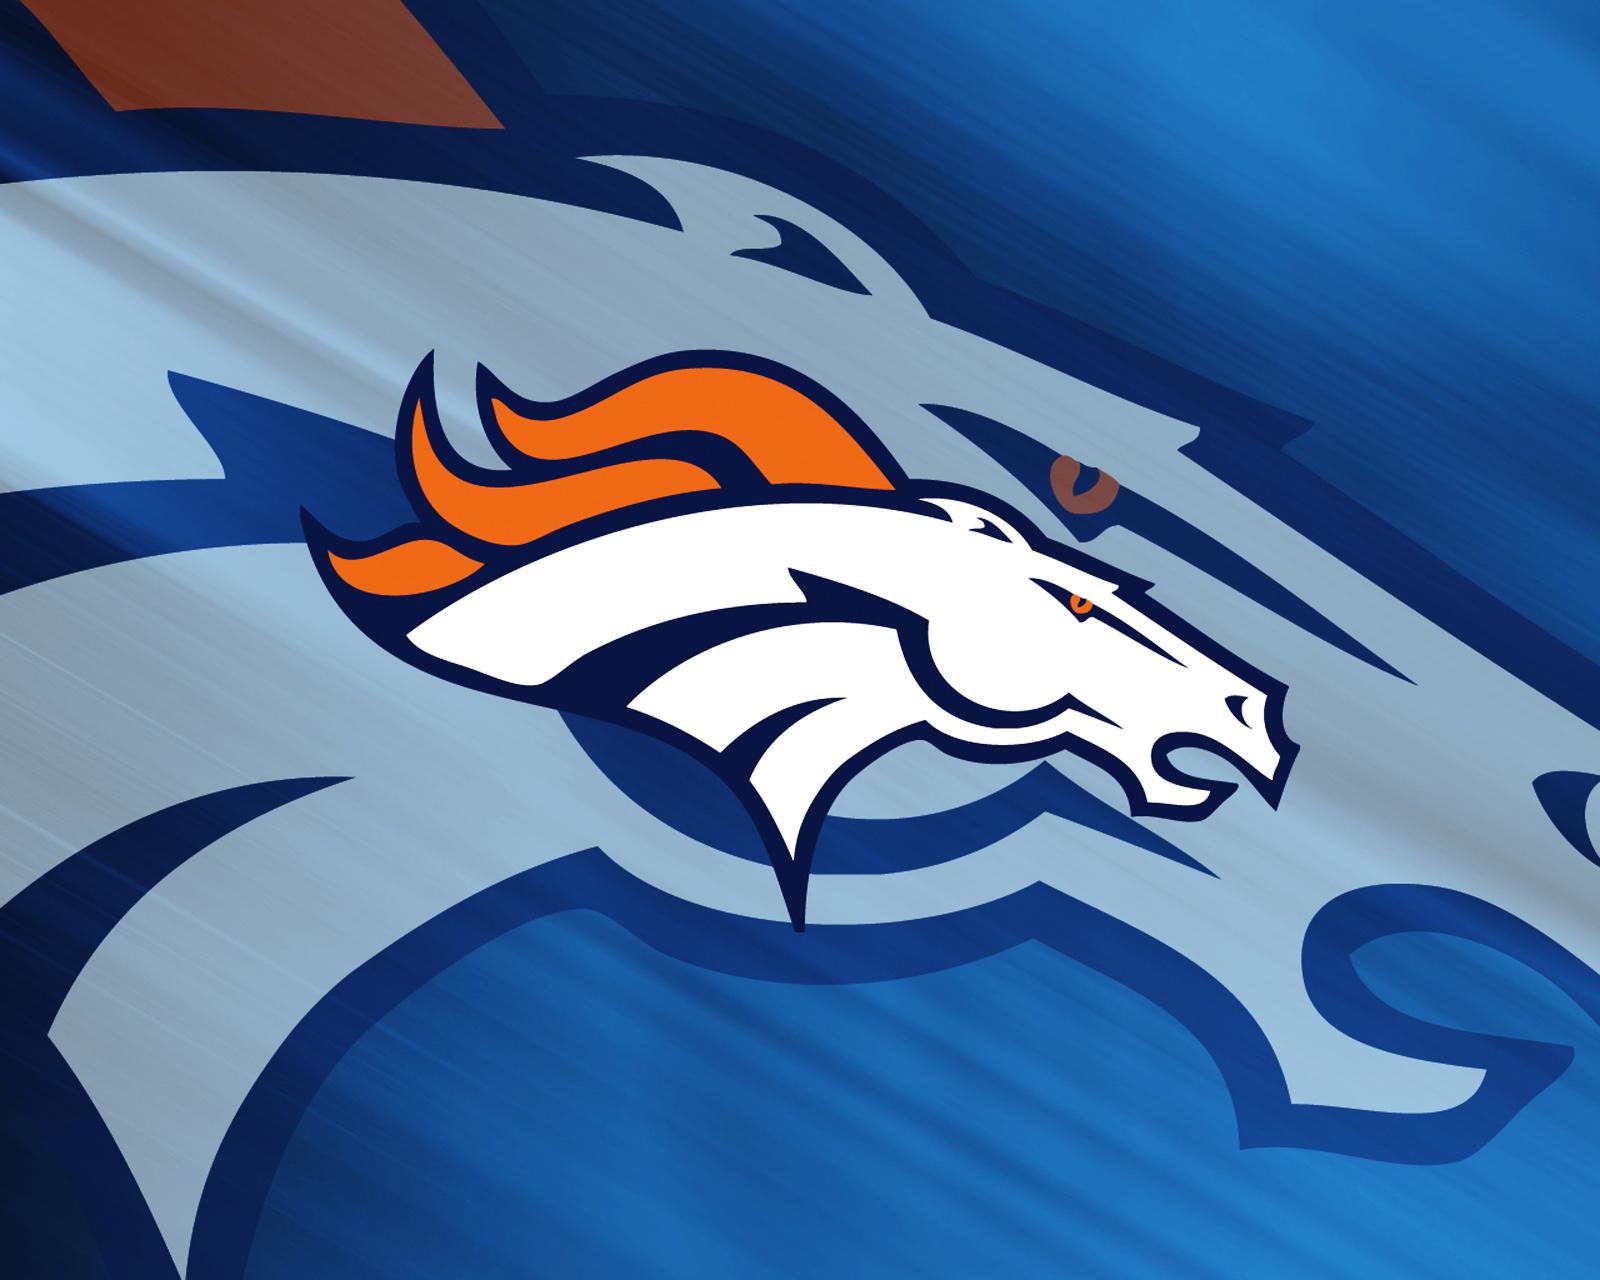 http://3.bp.blogspot.com/-SwiAXiU7TkM/TnjZqLat9wI/AAAAAAAABNY/UAtcyuEMMKo/s1600/Denver_Broncos_Symbol_American_Football_Team_HD_Wallpaper_Vvallpaper.Net.jpg